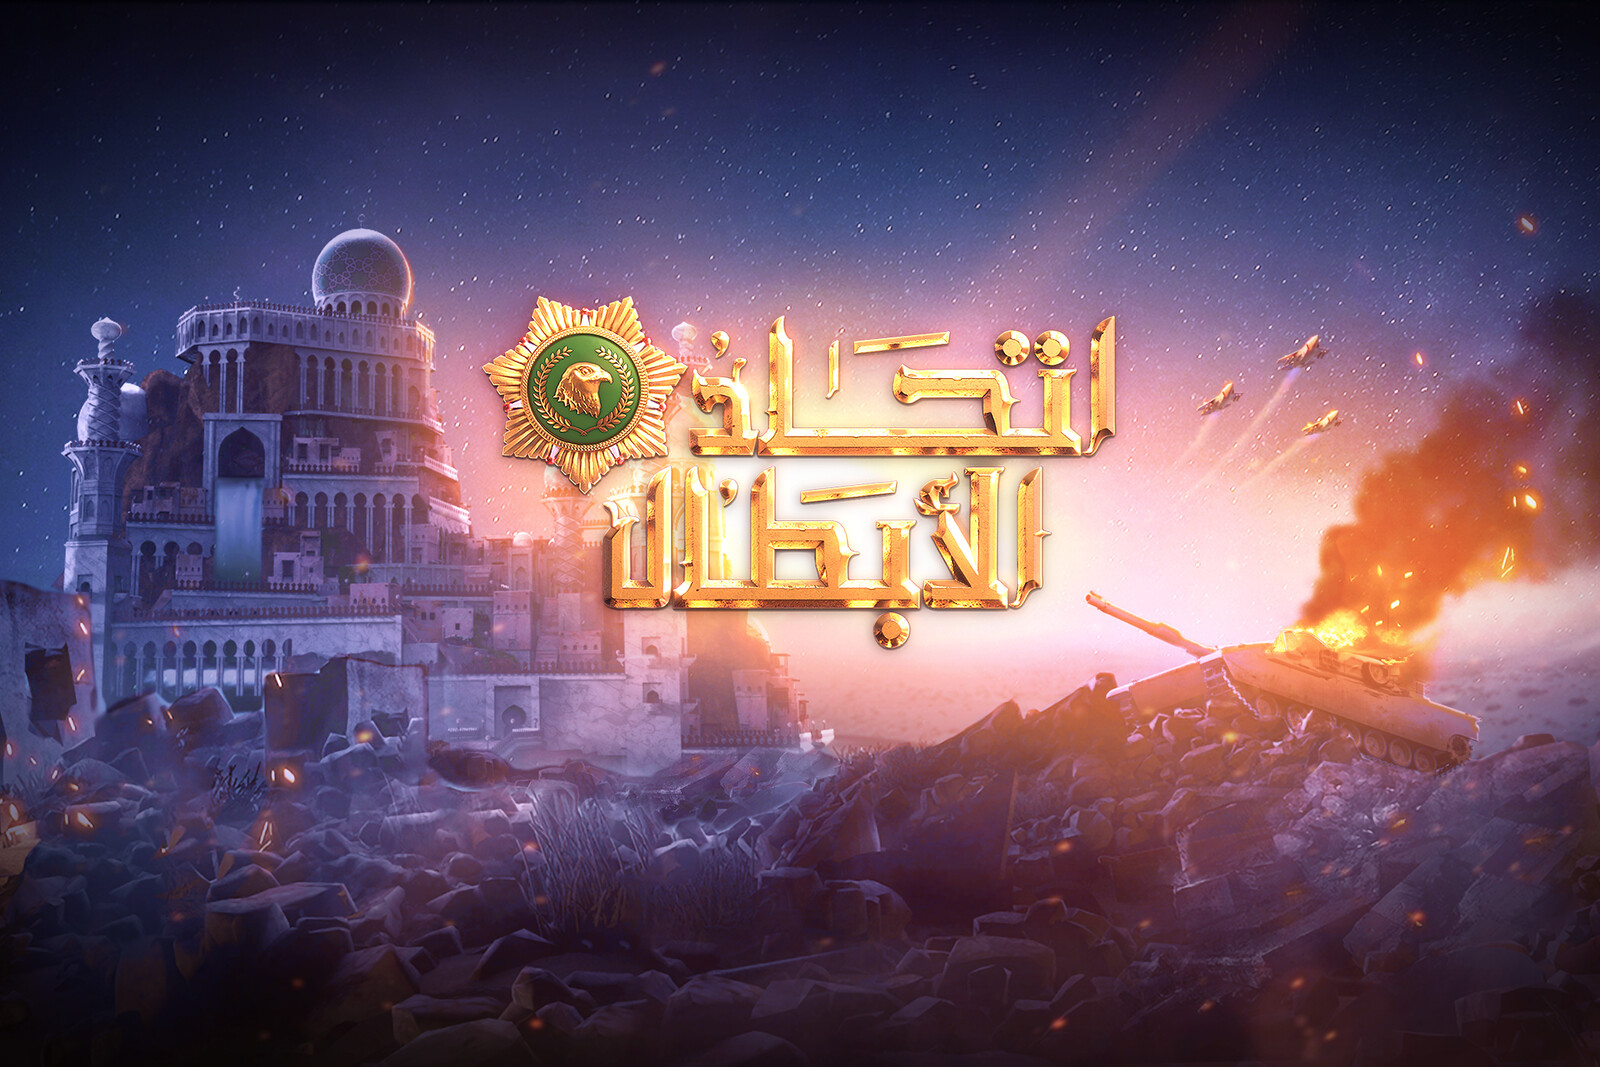 Etihad Al Abtal (Heroes United)